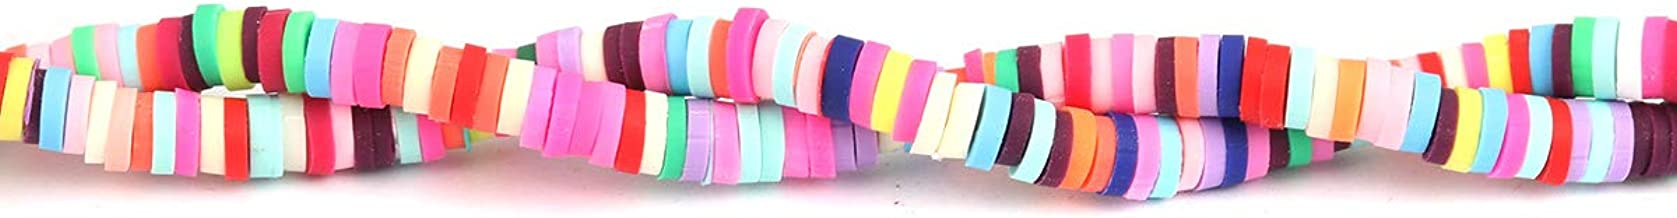 SiAura Material - Perlas de Arcilla de polímero (2 Unidades, 4 mm de diámetro)